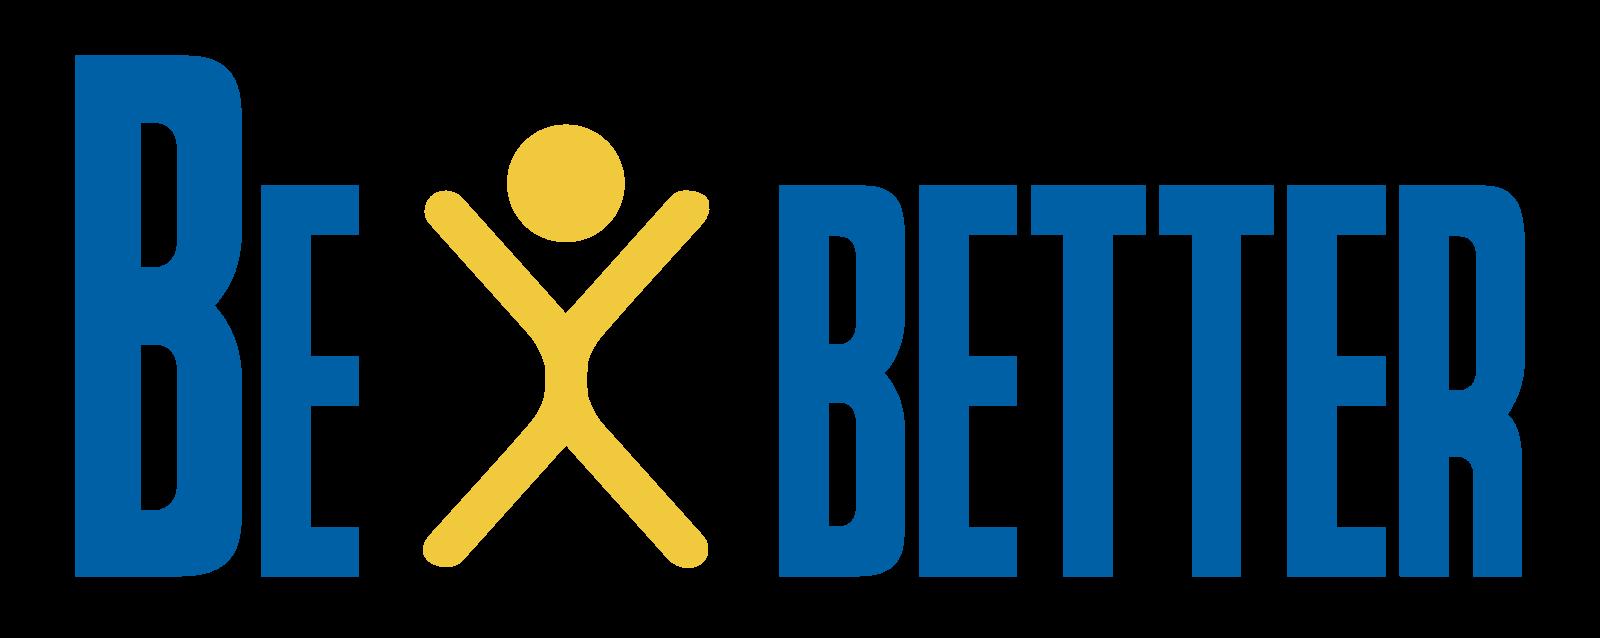 BeBetter Motywacja Logo